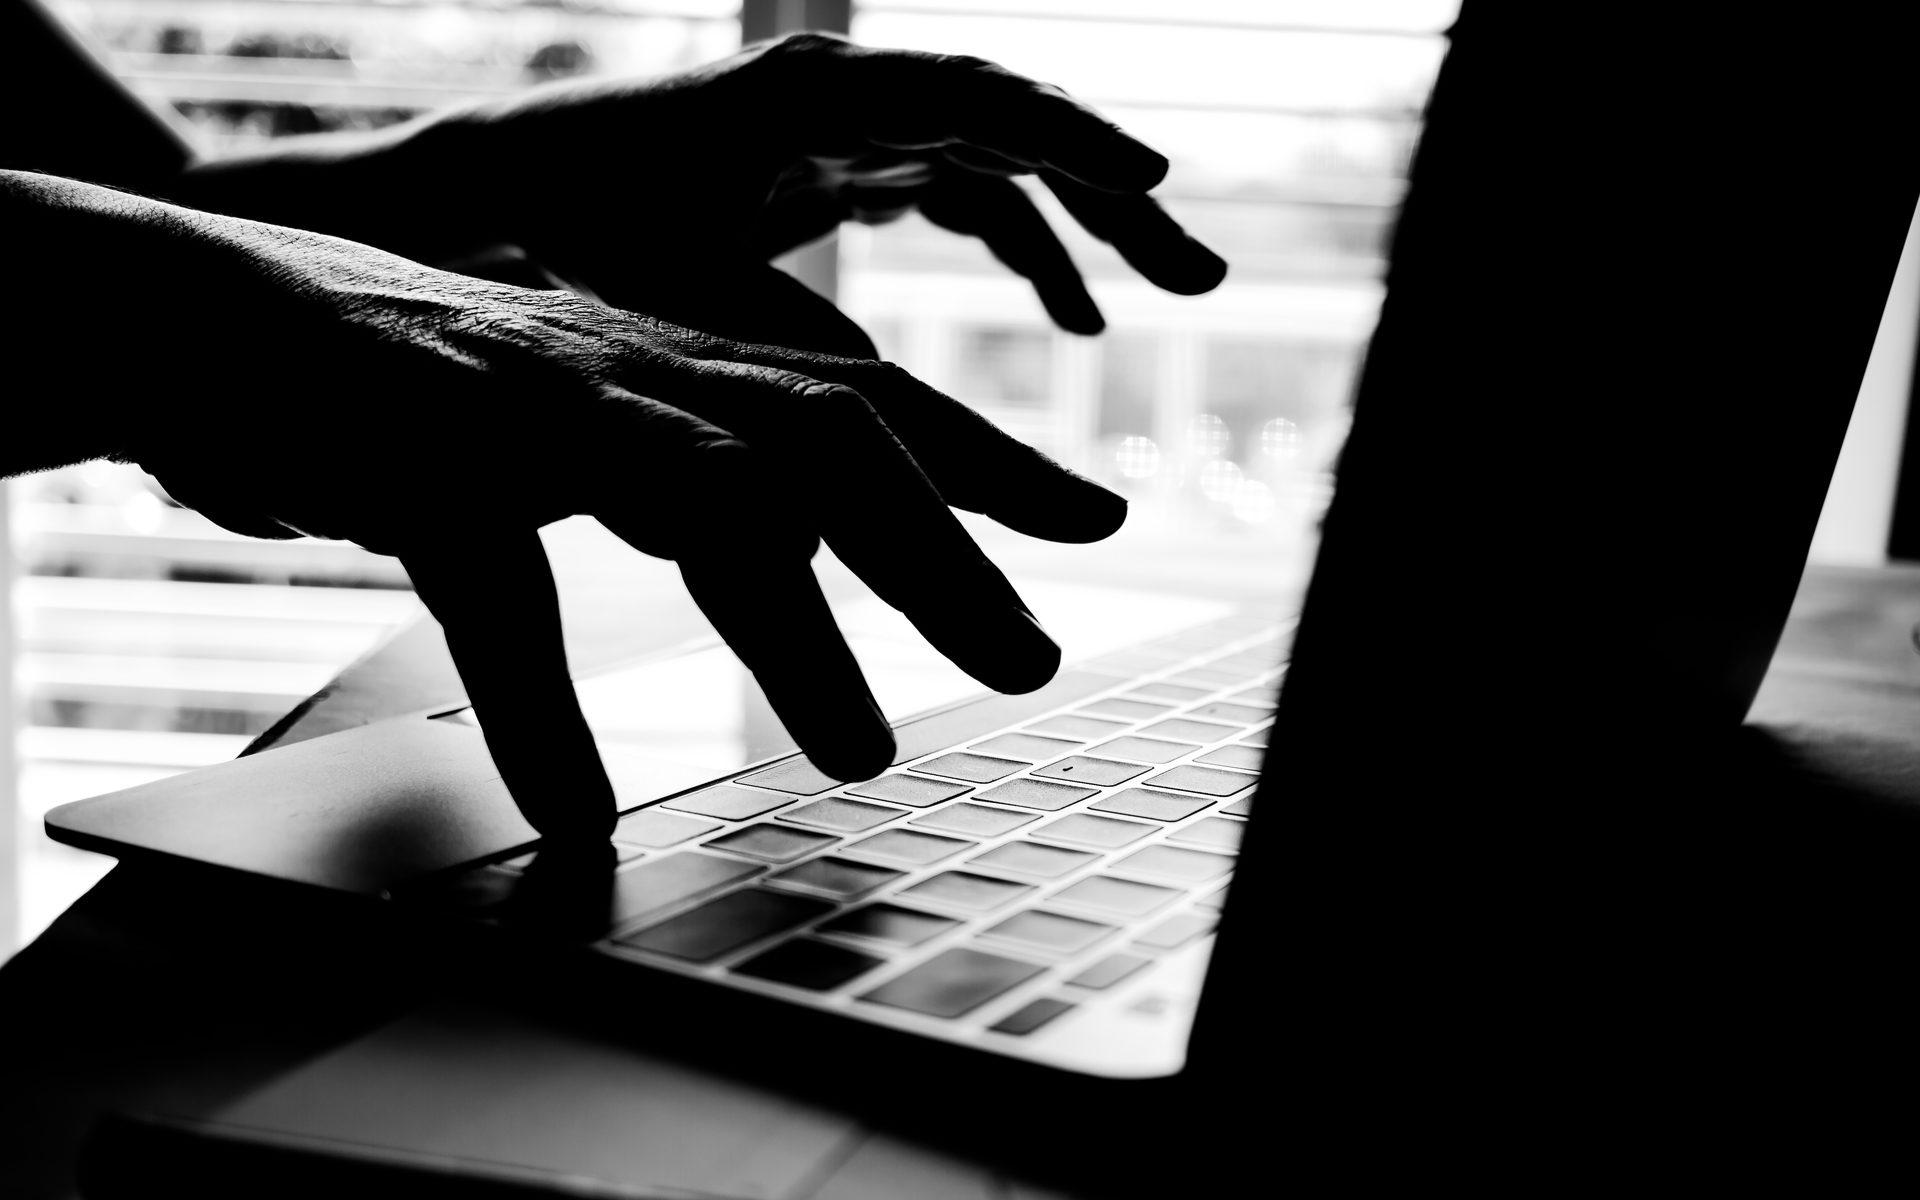 bitpoint cryptocurrency exchange hack